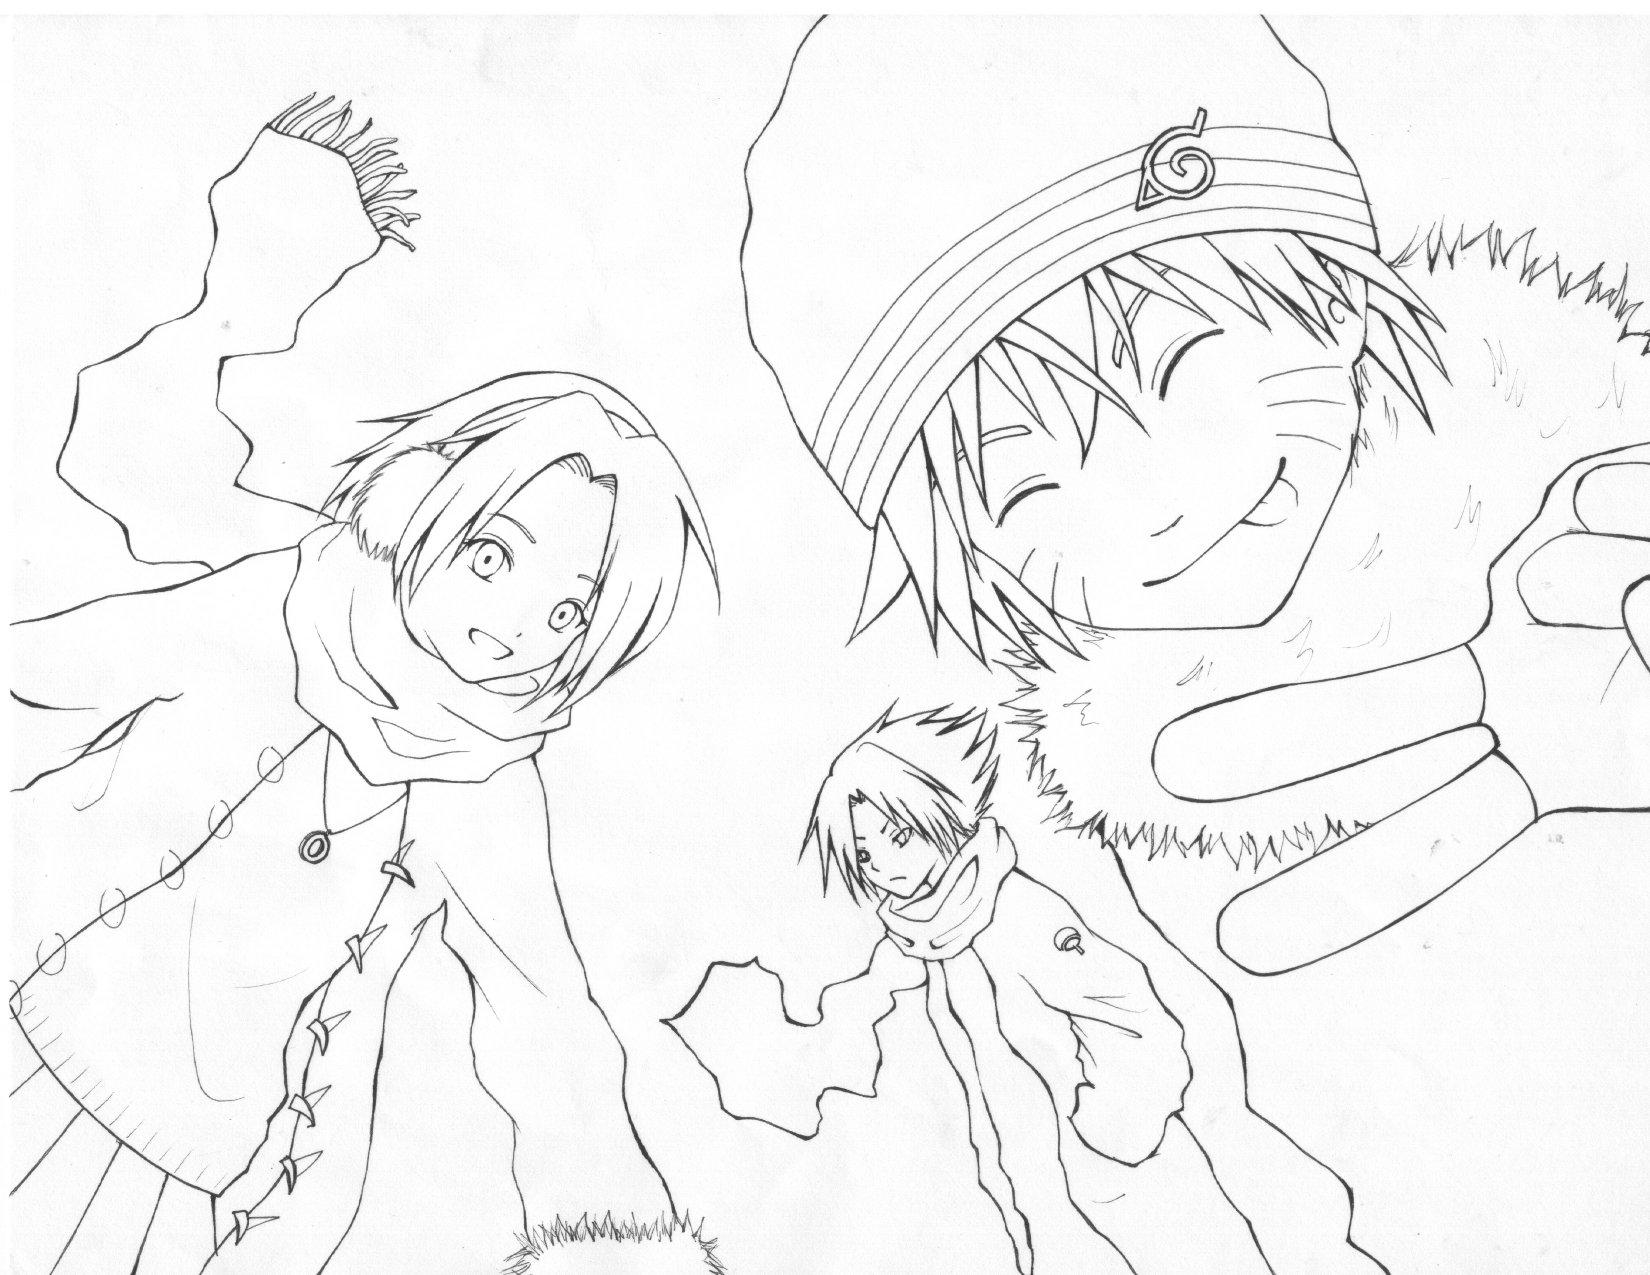 Naruto - winter lineart by panchan77